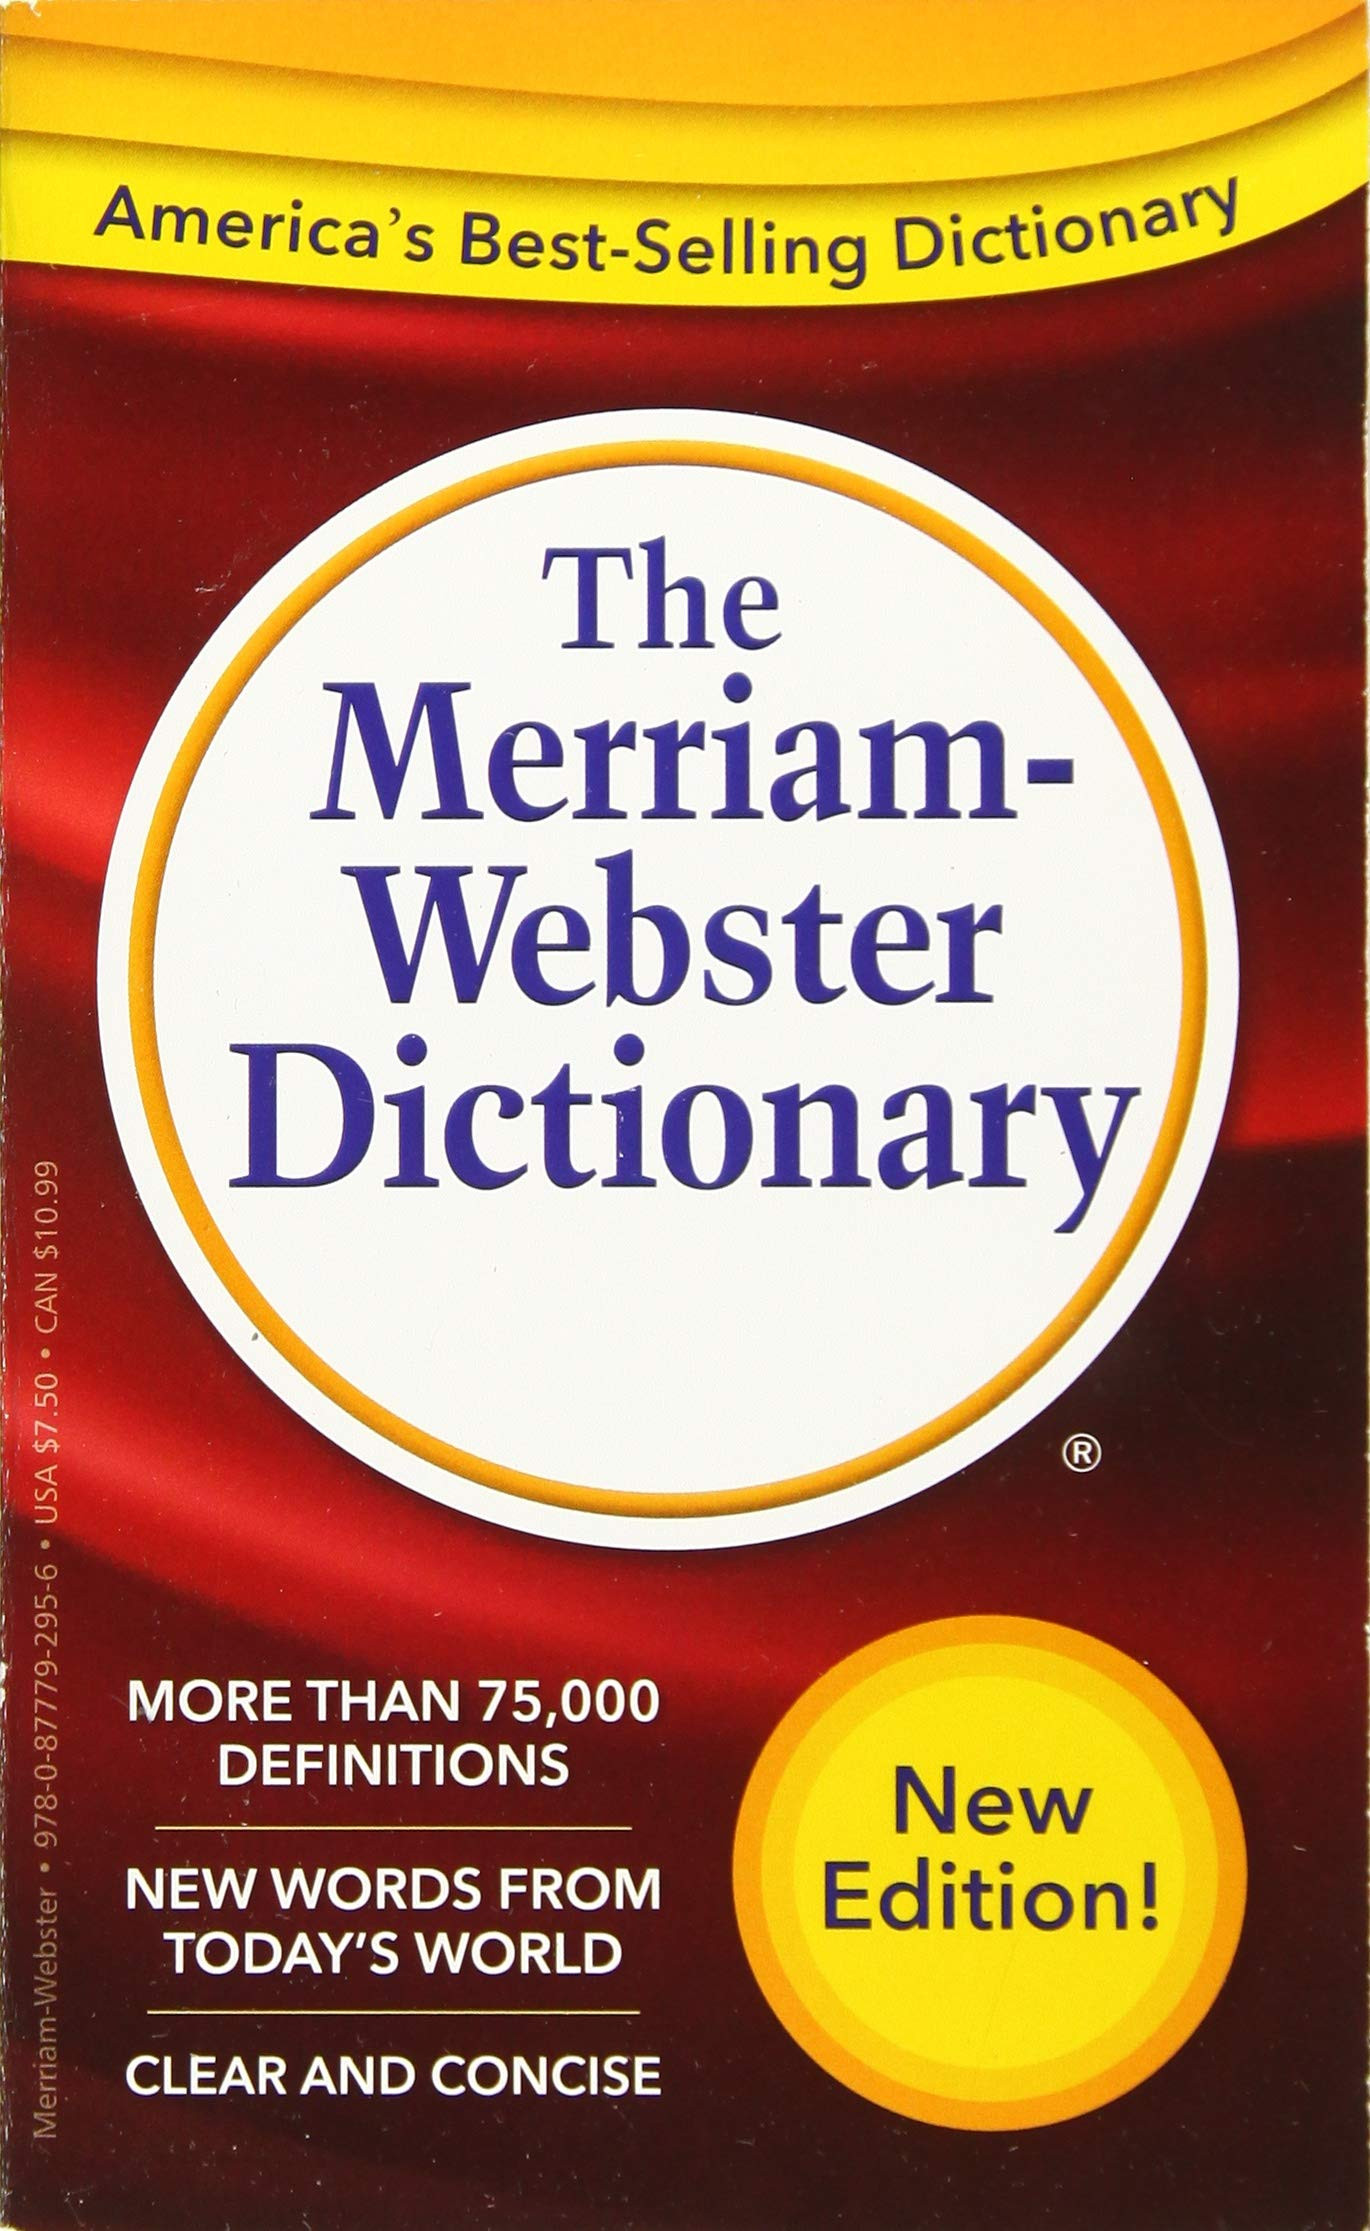 Merriam-Webster to redefine